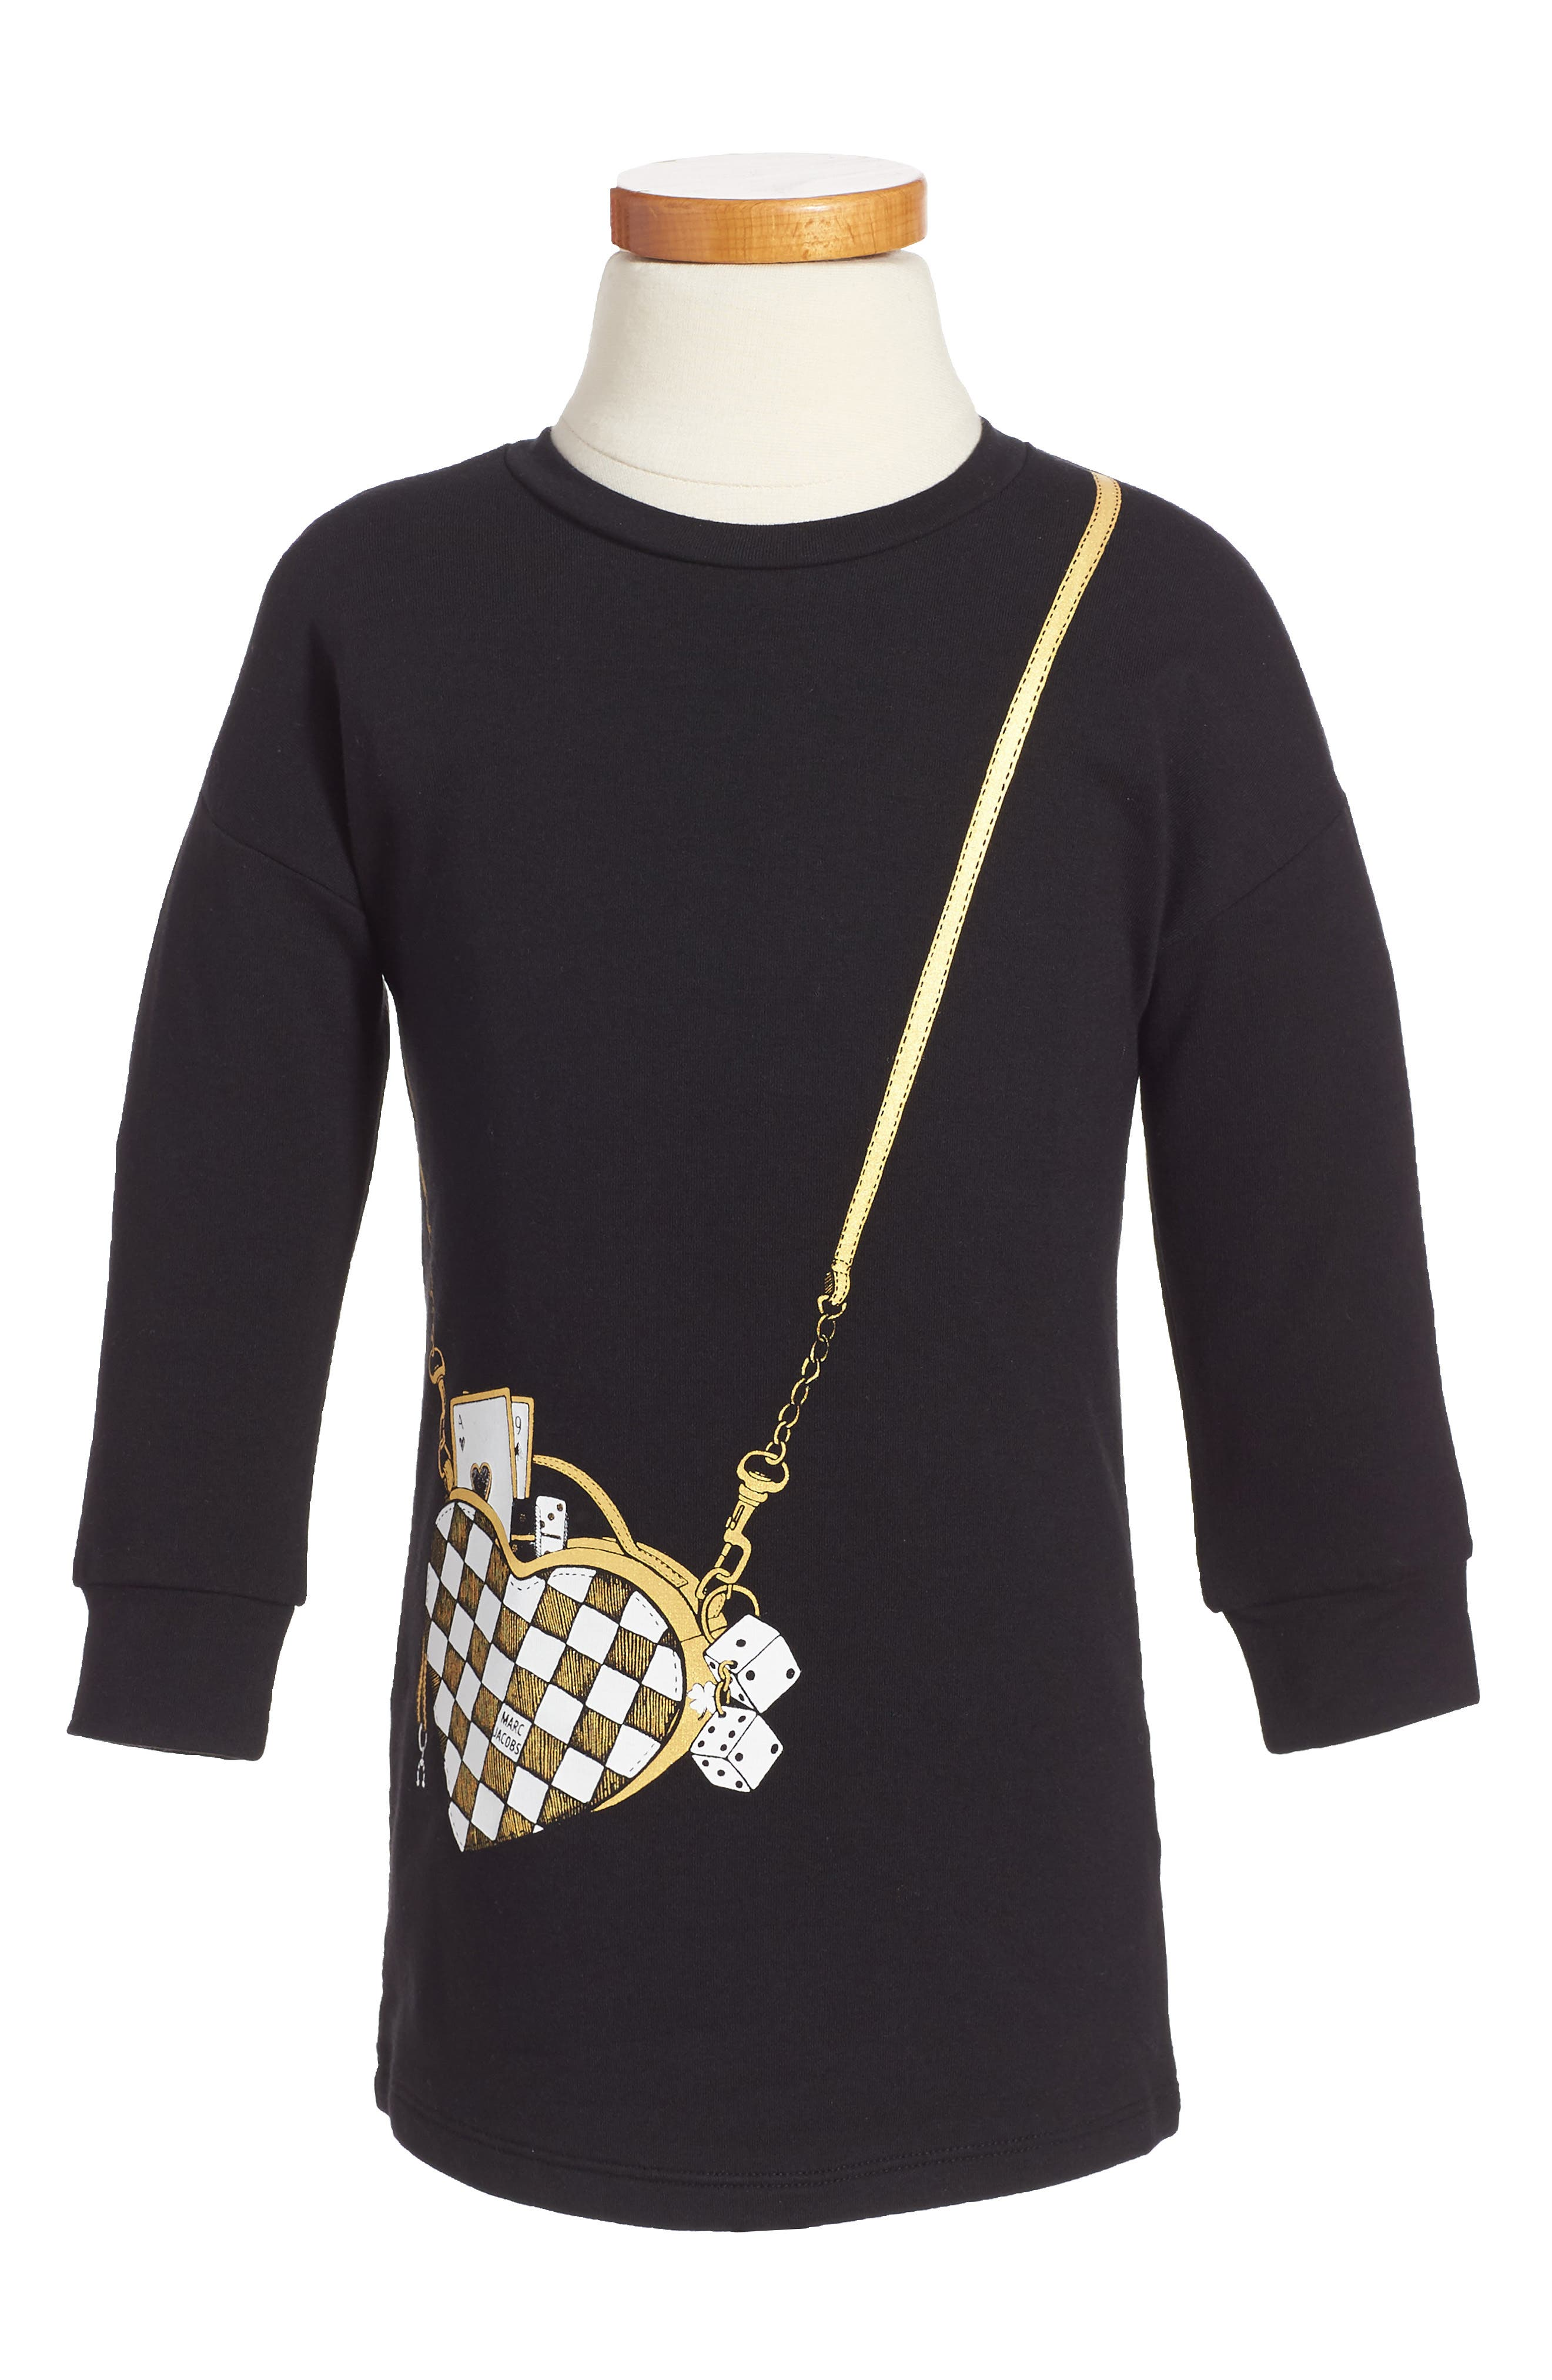 Main Image - LITTLE MARC JACOBS Trompe L'Oeil Sweatshirt Dress (Toddler Girls, Little Girls & Big Girls)